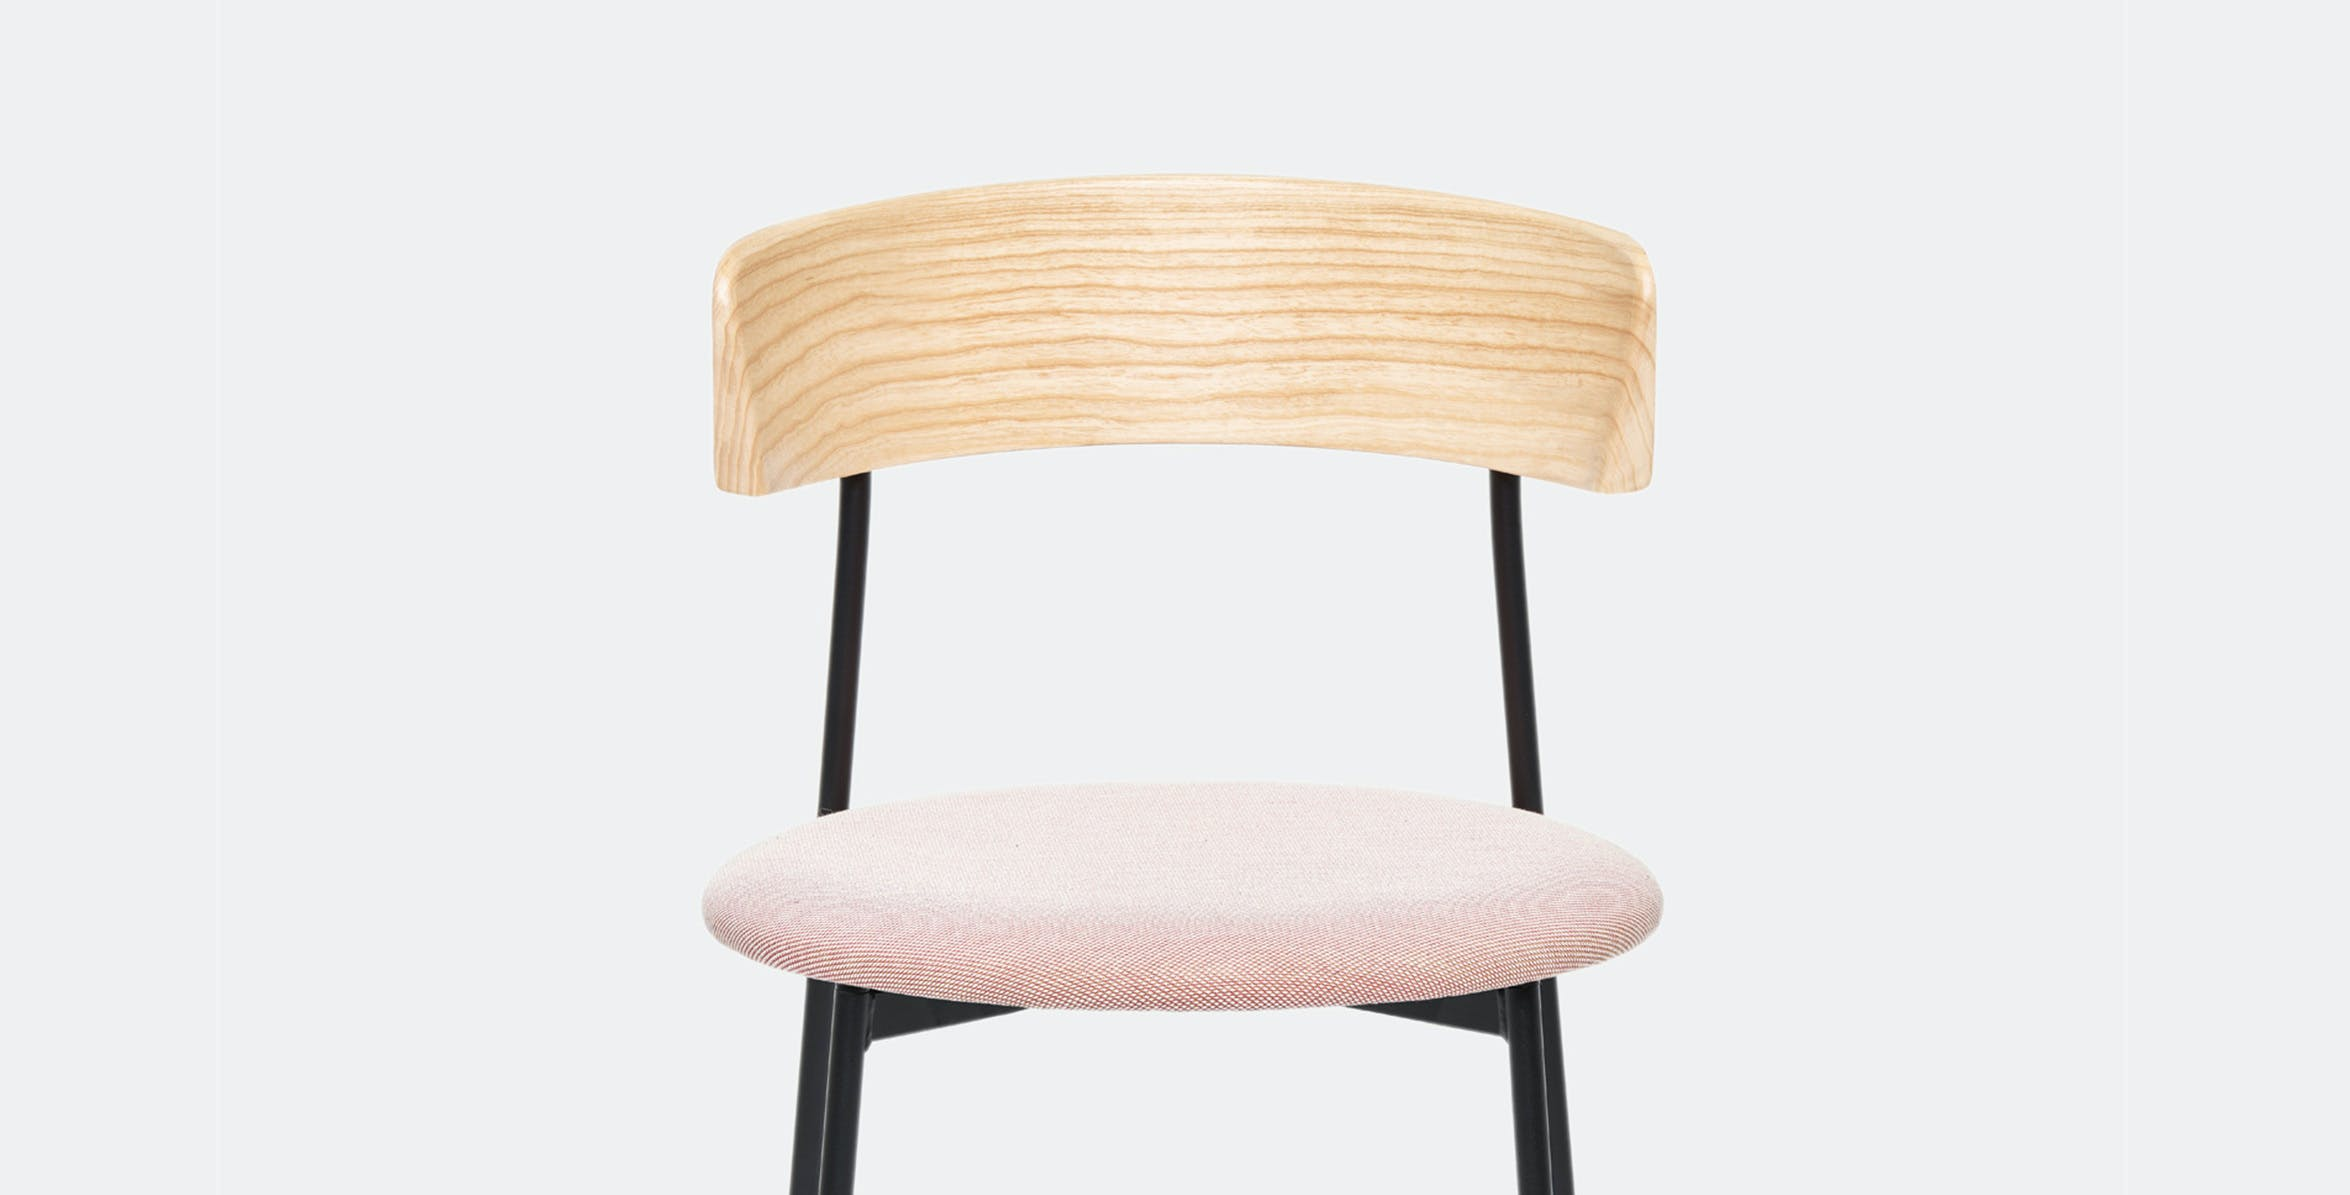 Designer martin hirth